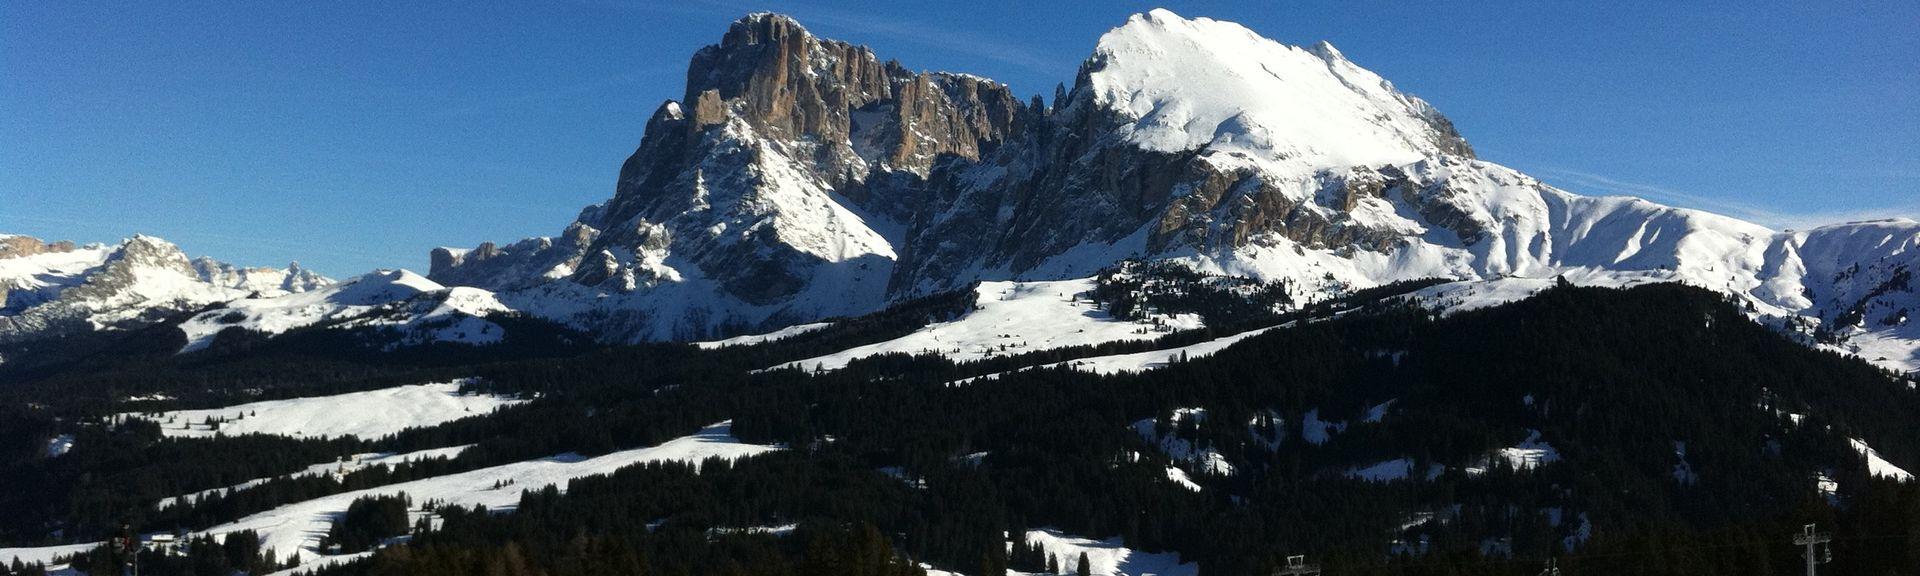 Alta Badia, Trentino-Zuid-Tirol, Italië